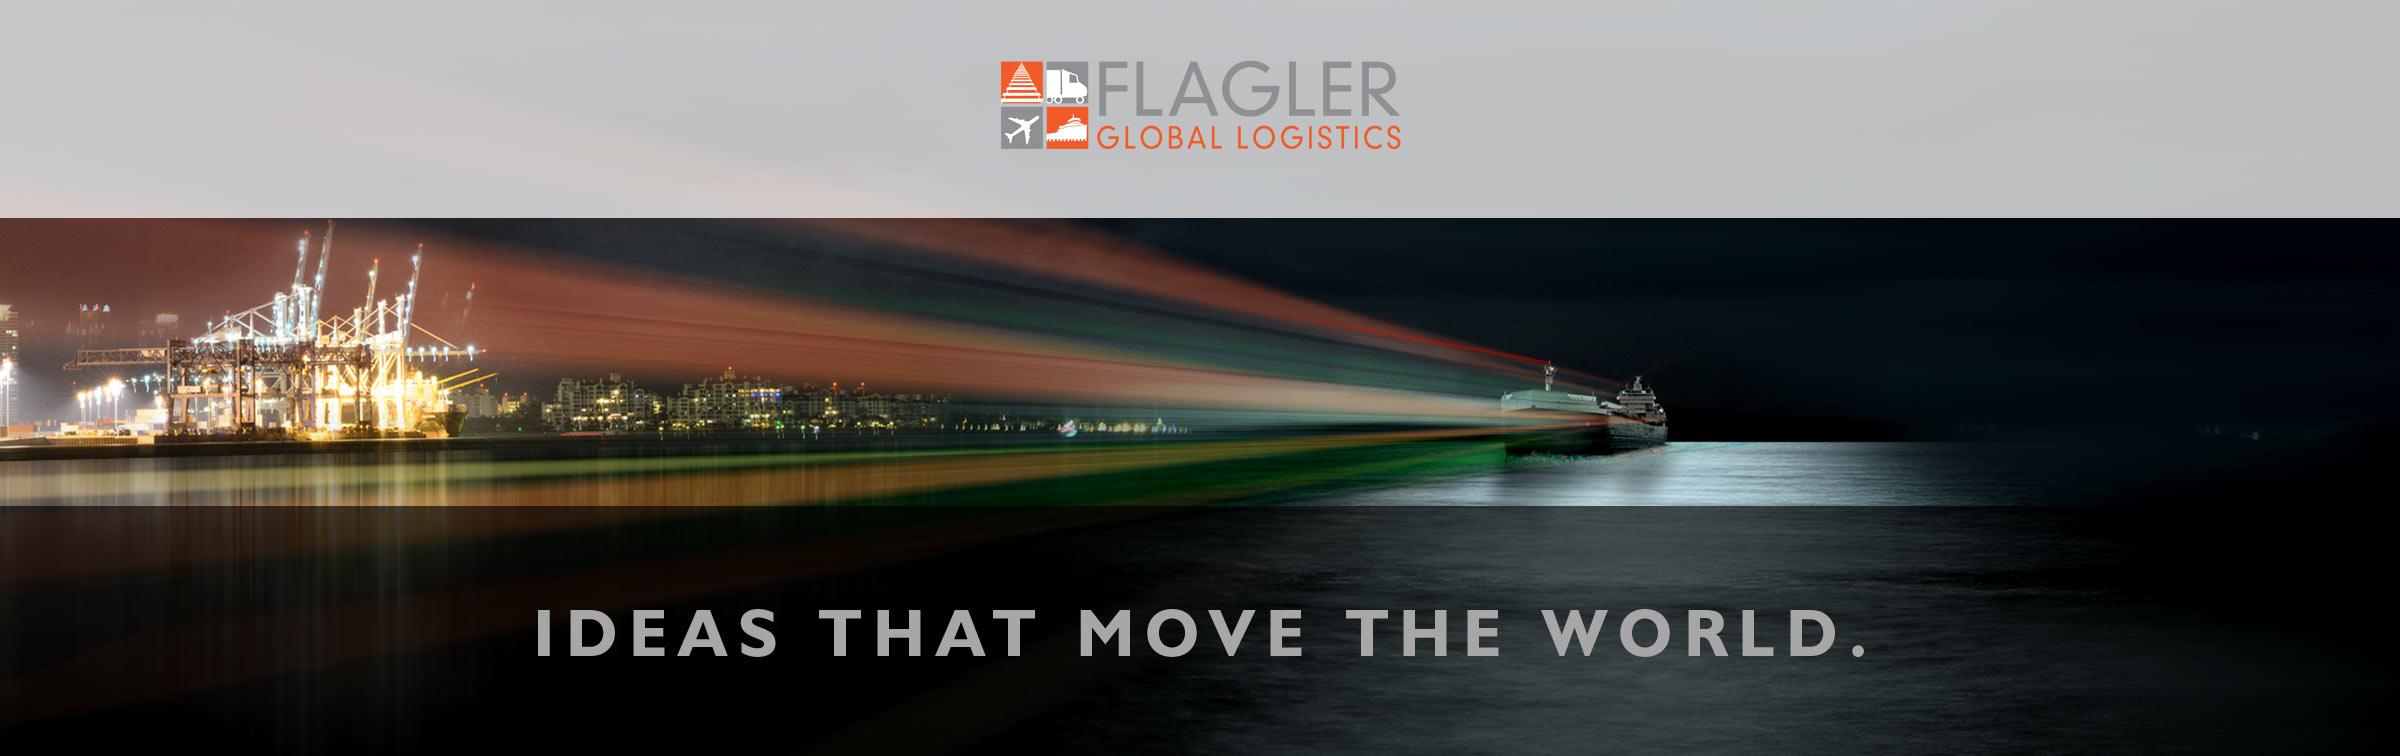 Flagler Global Logistics  Florida East Coast Industries